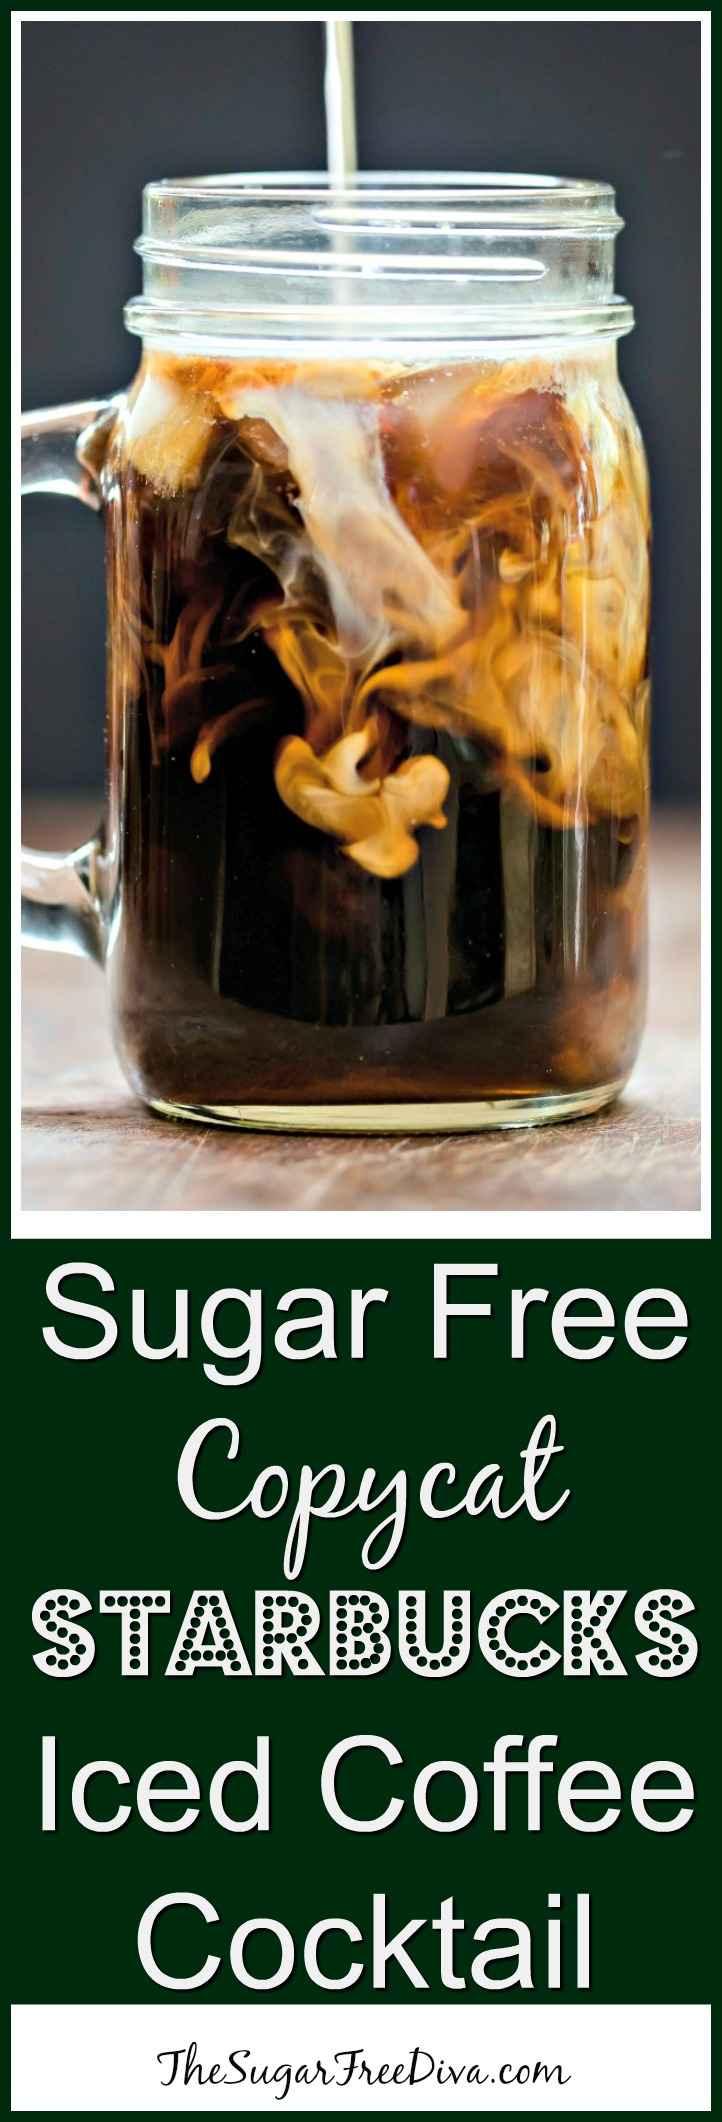 Sugar Free Copycat Starbucks Iced Coffee Cocktail